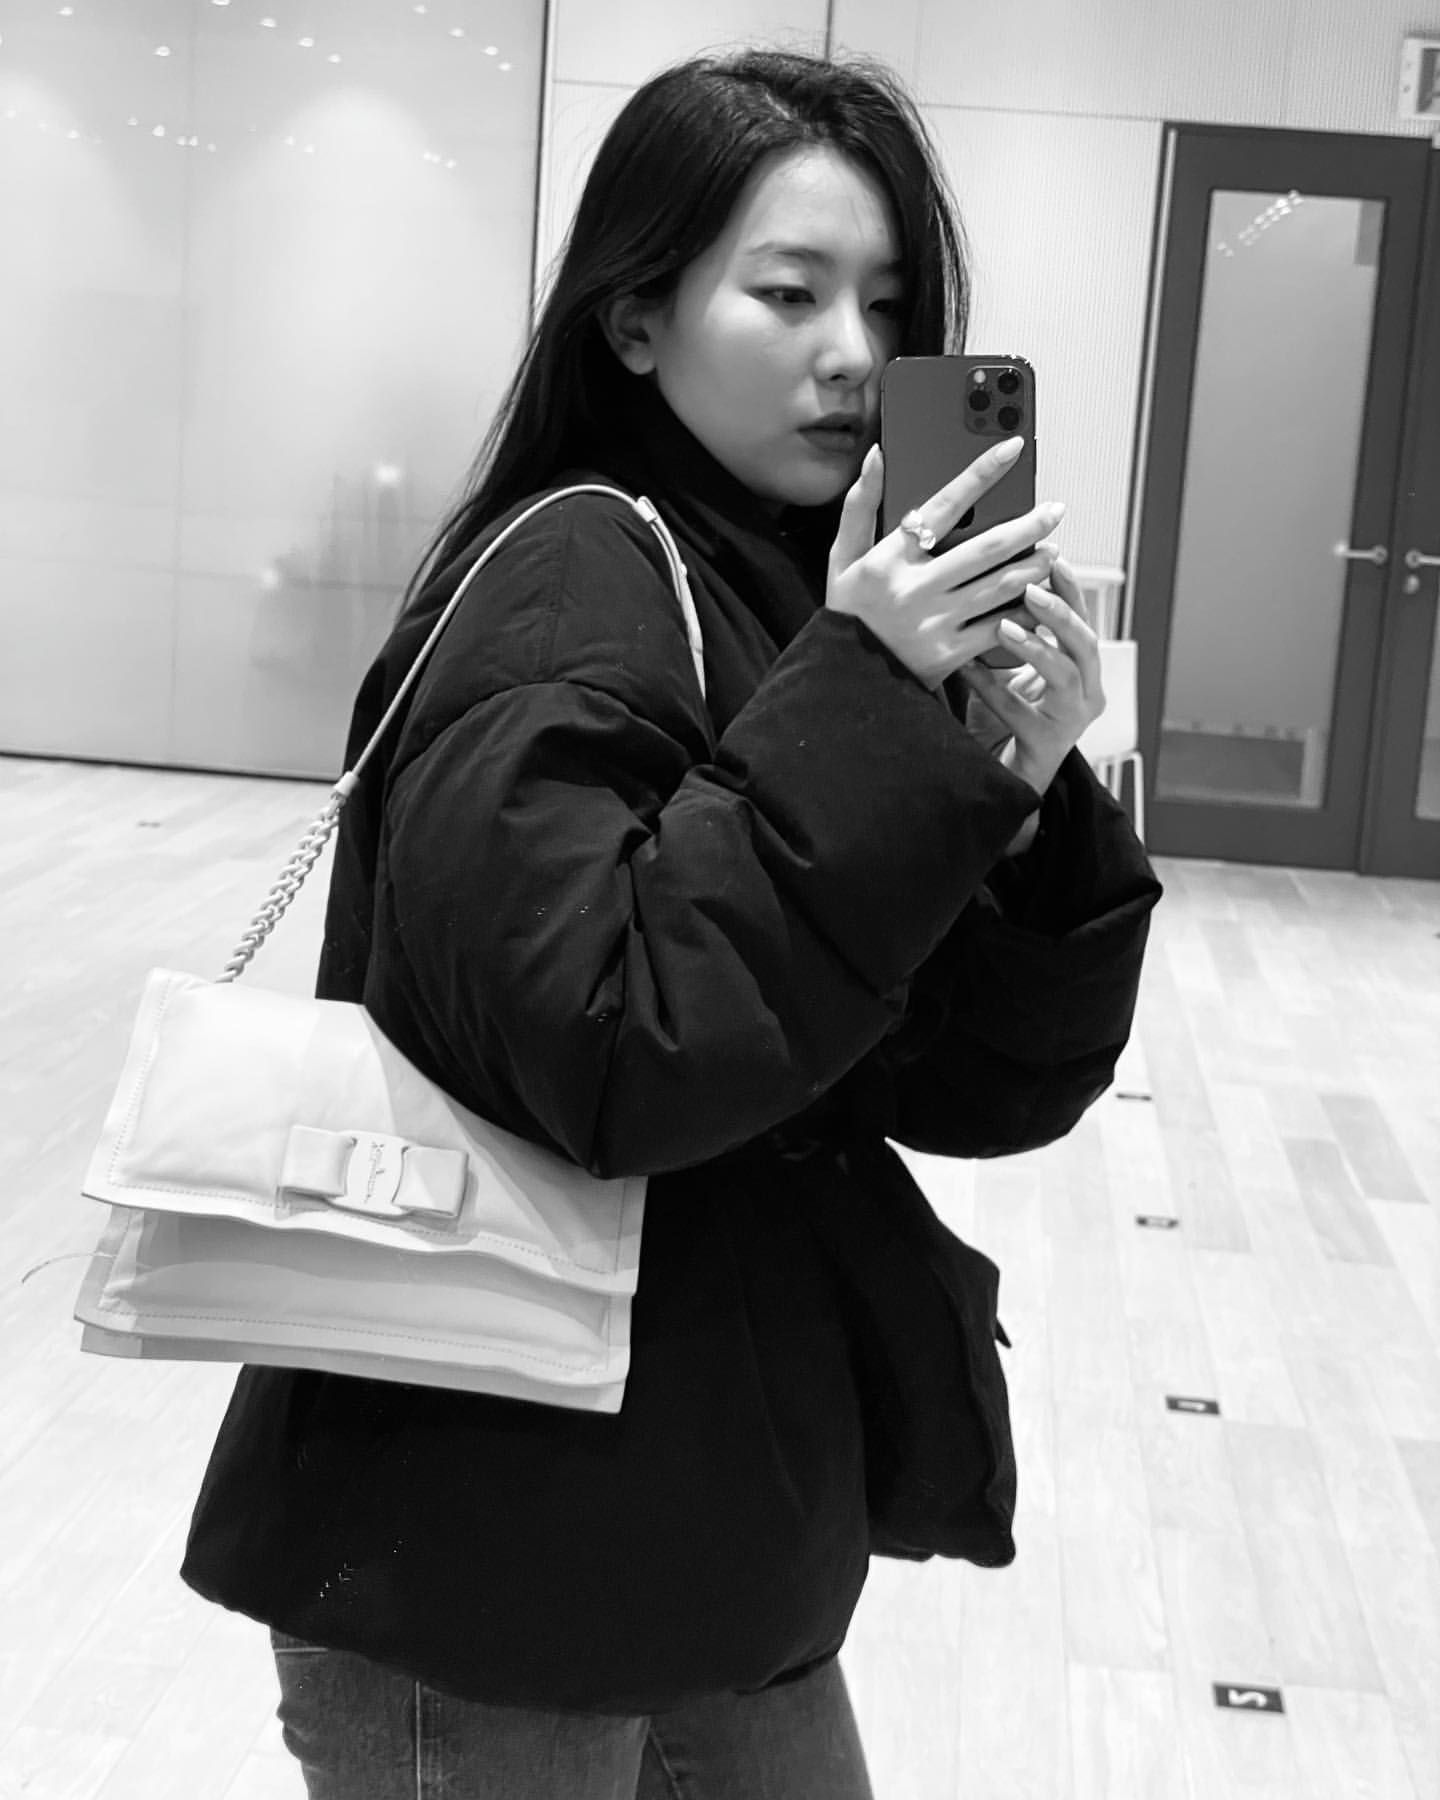 Pin on Red Velvet 레드벨벳ʕ•ᴥ•ʔ